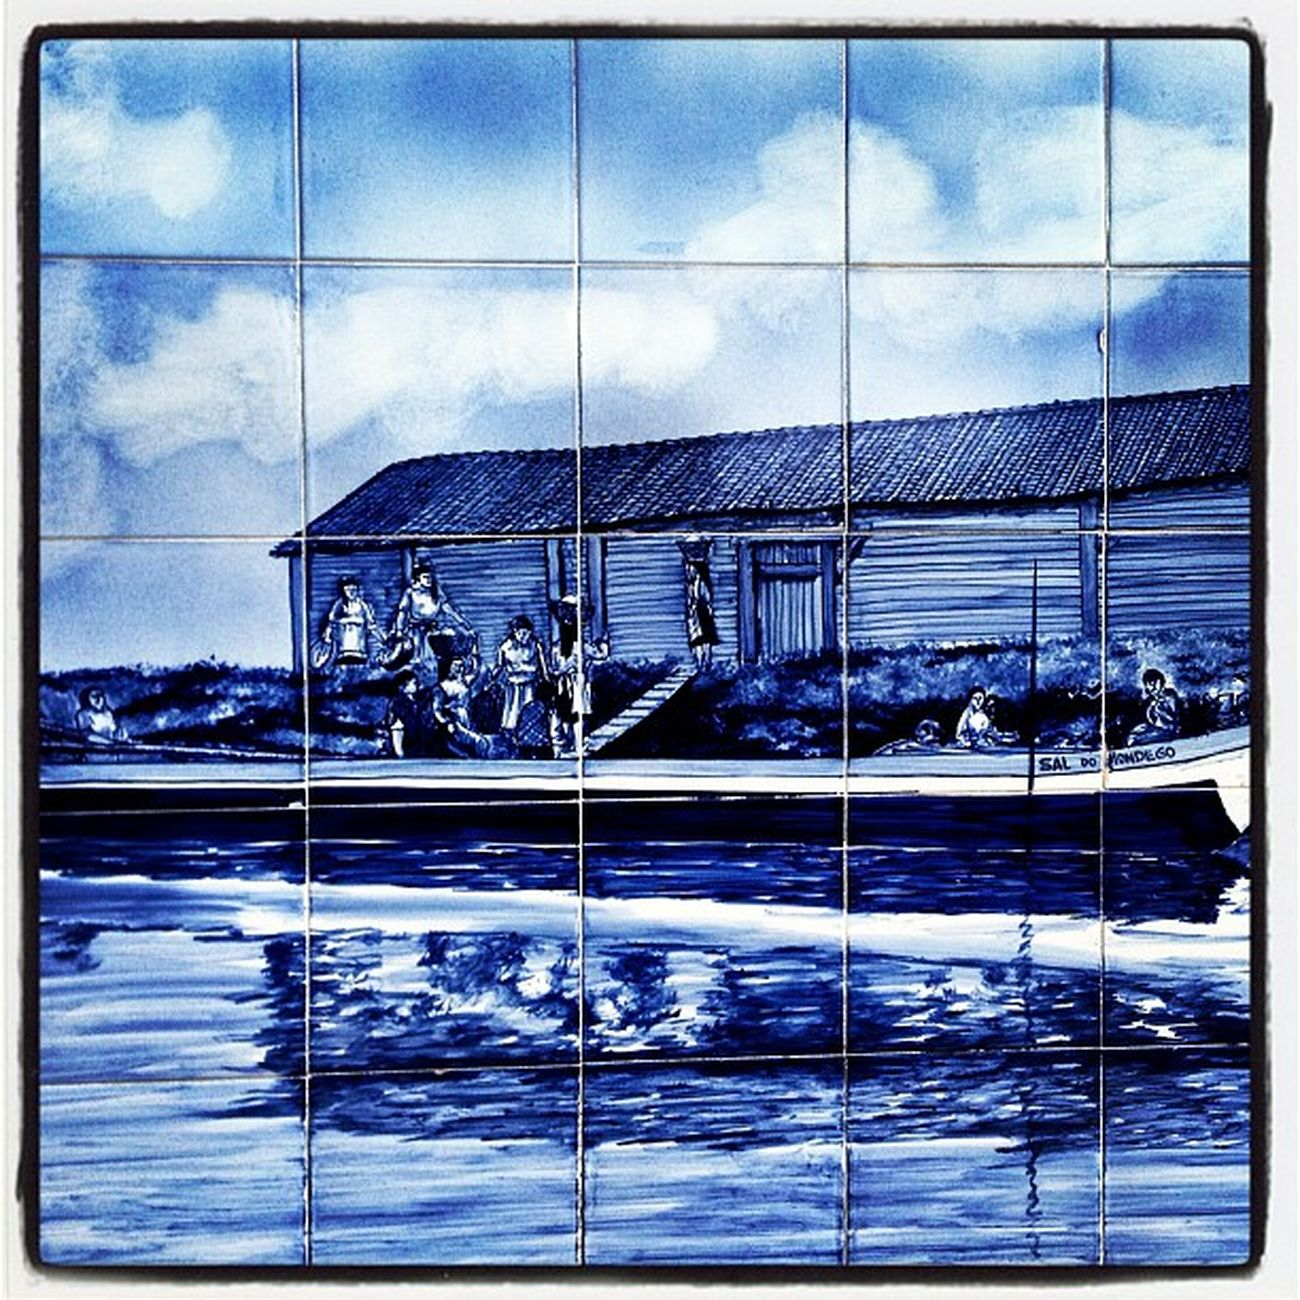 #figueira #figueiradafoz #clouds #iphone5 #iphonesia #iphoneonly #iphoneonly #iphonephotography #instagood #instagram #instalove #instamood #instadaily #instafamous #instagramhub #statigram #statigramhub #photography #photooftheday #photography #photoofth Instagramhub Rotadassalinas Instadaily Clouds Pictureoftheday Photography Instalove Iphoneonly Figueira Salinas Figueiradafoz Photooftheday Portugaligers Iphonesia Igersportugal Instagram Portugaldenorteasul IPhone5 Morraceira Instamood Sal Igers Iphonephotography Statigramhub Instagood Museusal Instafamous Batel Statigram